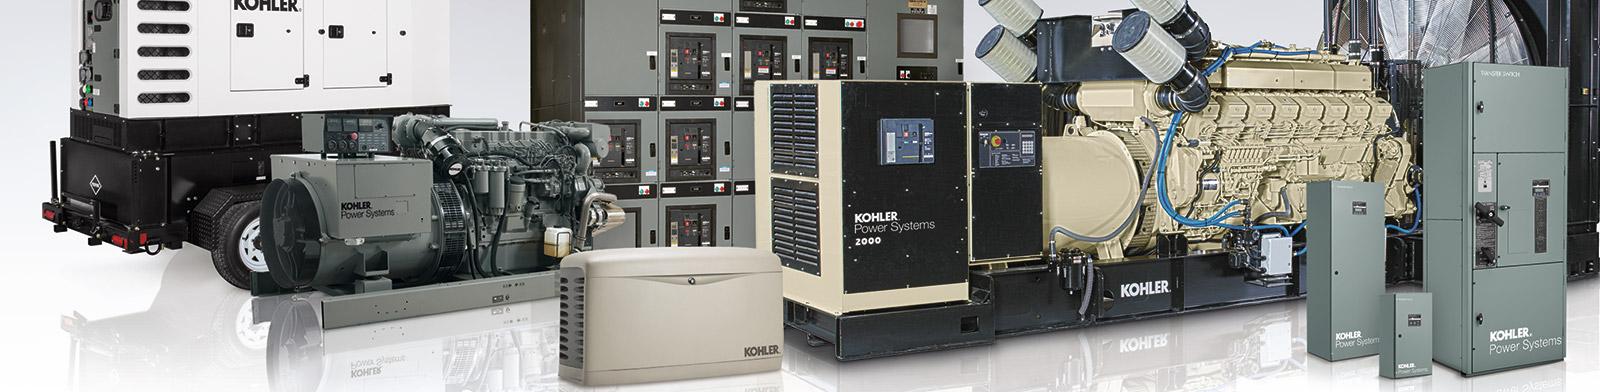 Essential Kohler Generator Technical Documents - TAW Power